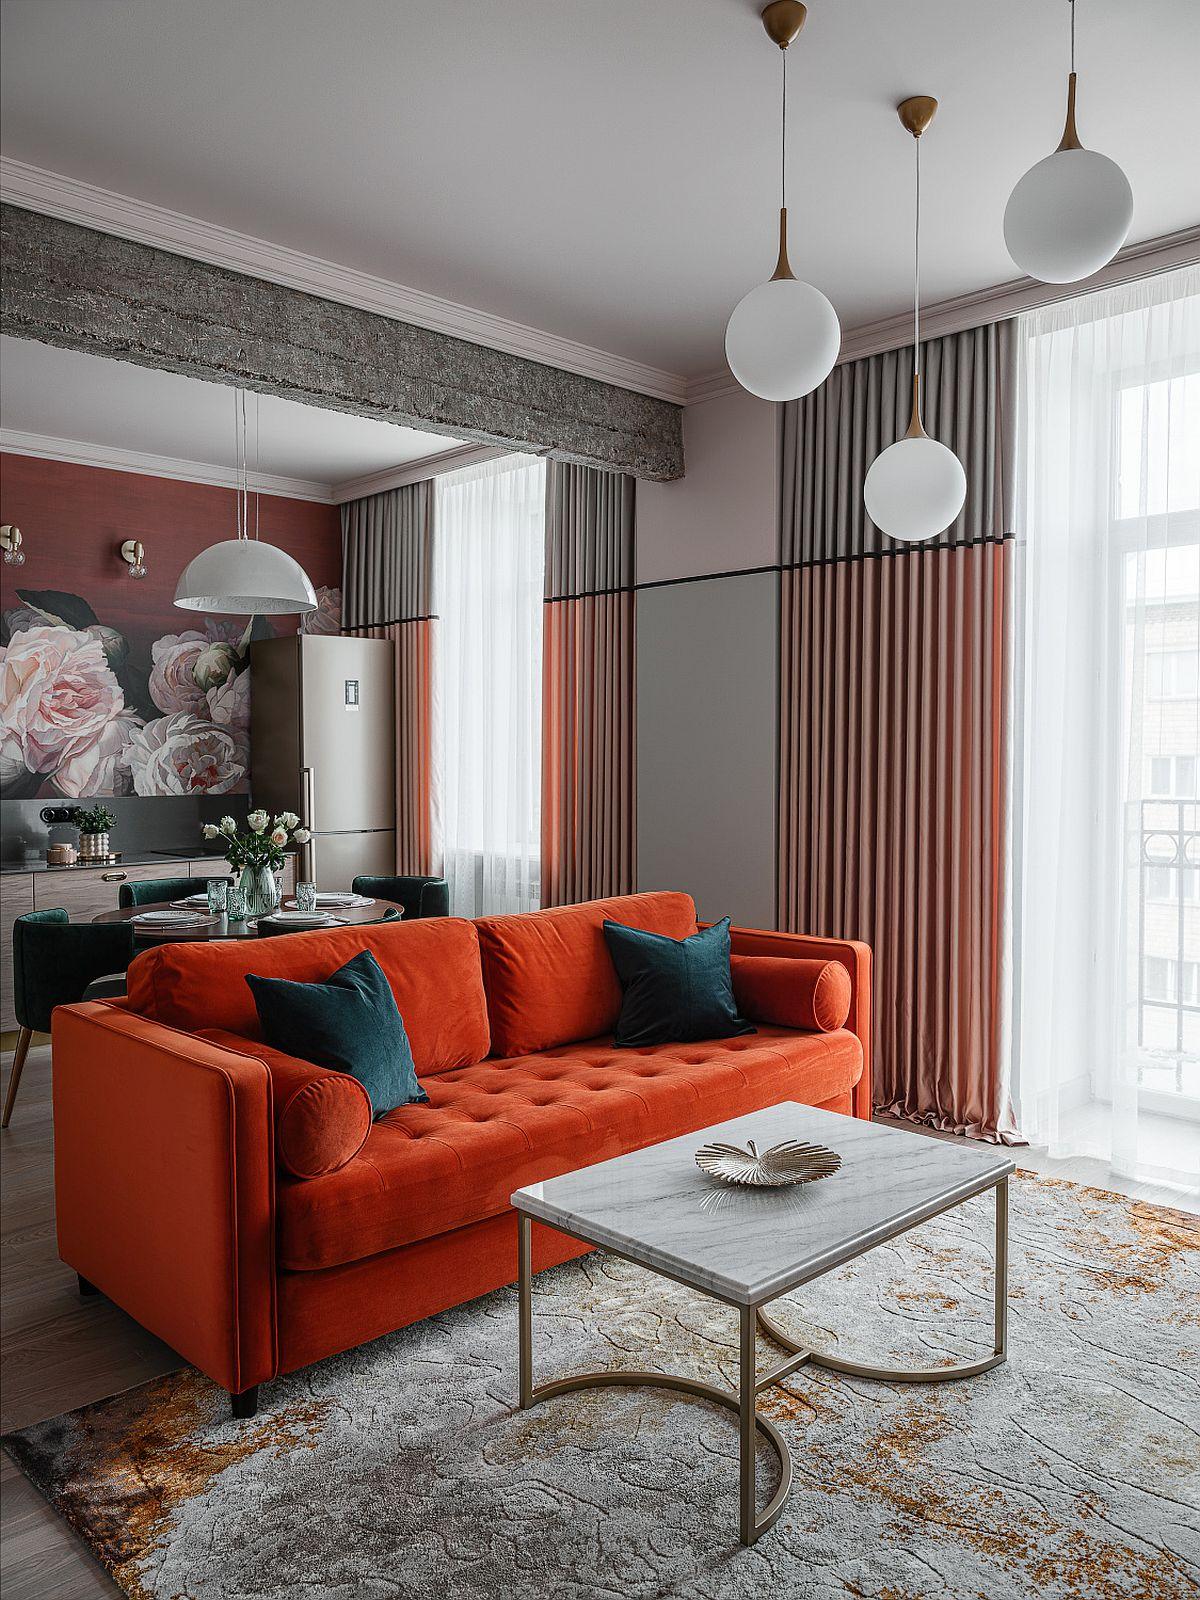 adelaparvu.com despre bucatarie cu tapet cu flori, designer Iulia Sheypunas, foto Vladimir Barabash (2)